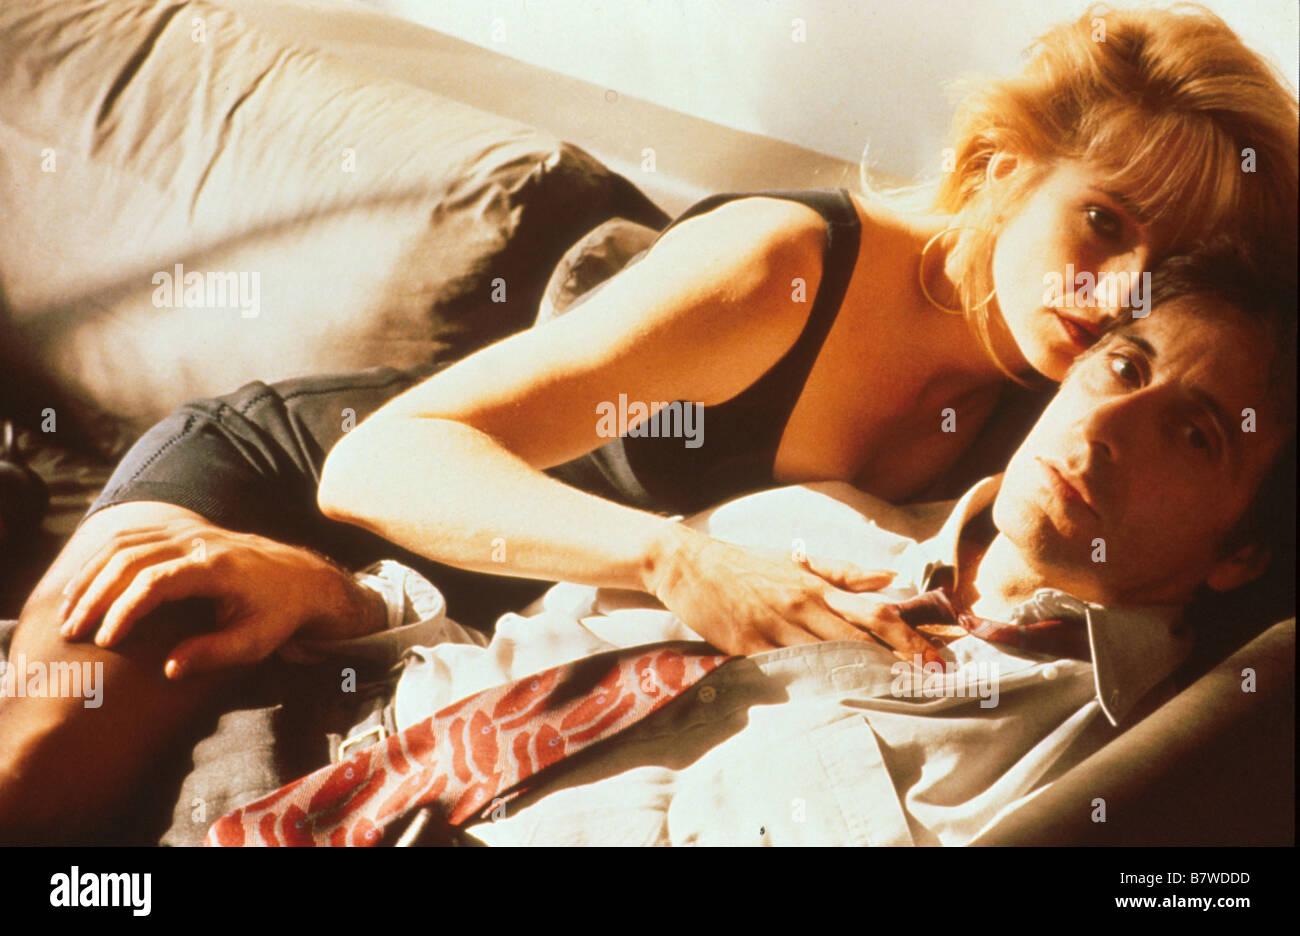 Nicole scherzinger x factor auditions in manchester england,Katrina Bowden Nude Photos and Videos Porno pic Robin Wright Photos,Rosie huntington whiteley shopping in new york city